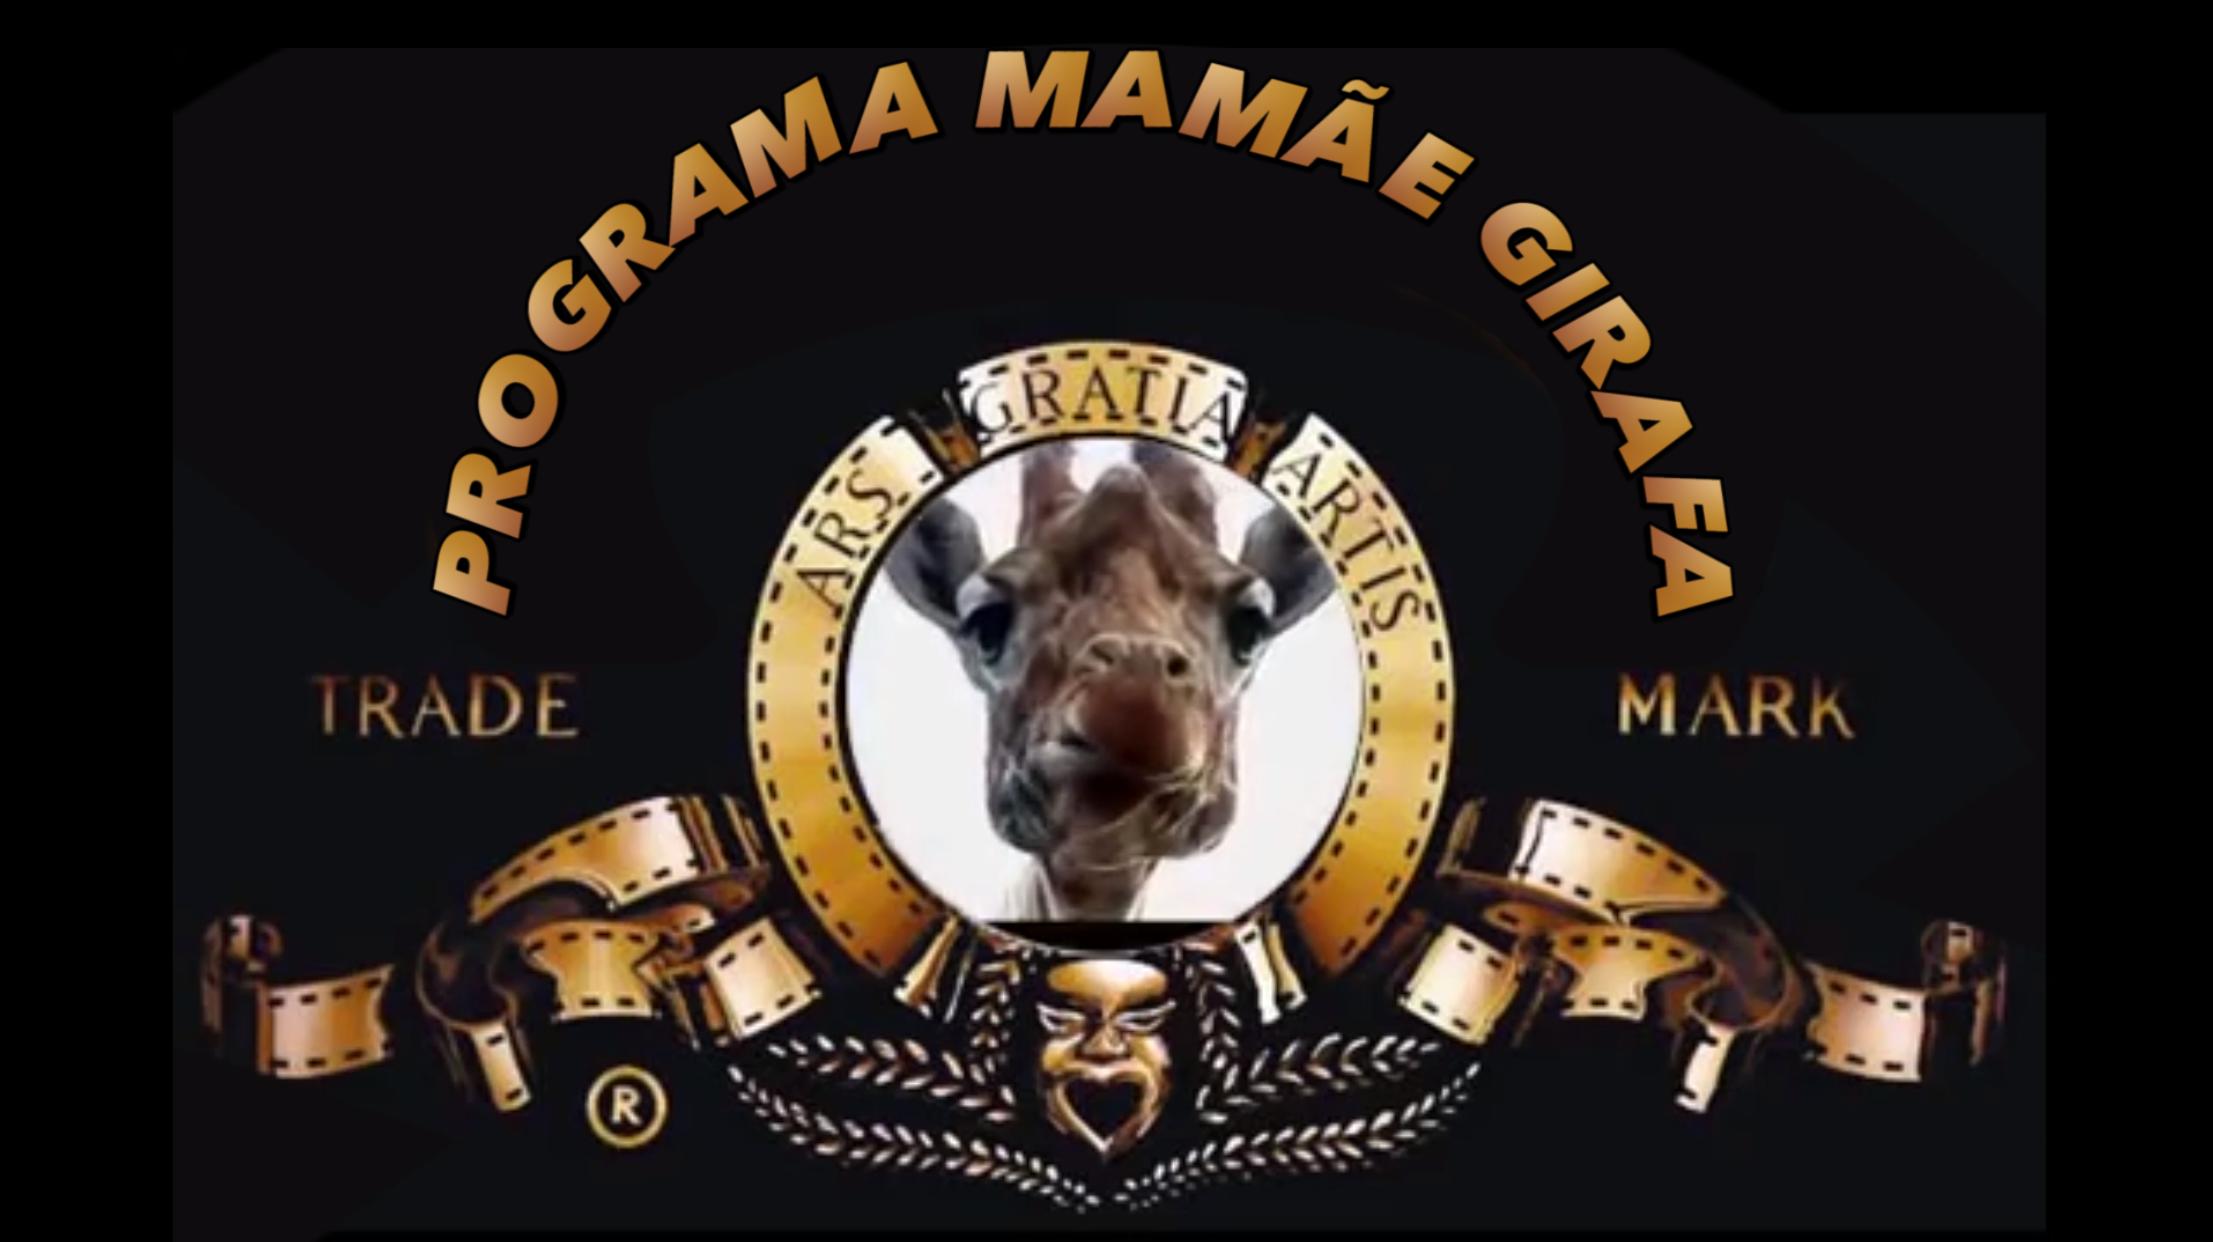 MAMAE GIRAFA EP7 TOQUE FÍSICO - 26.06.19